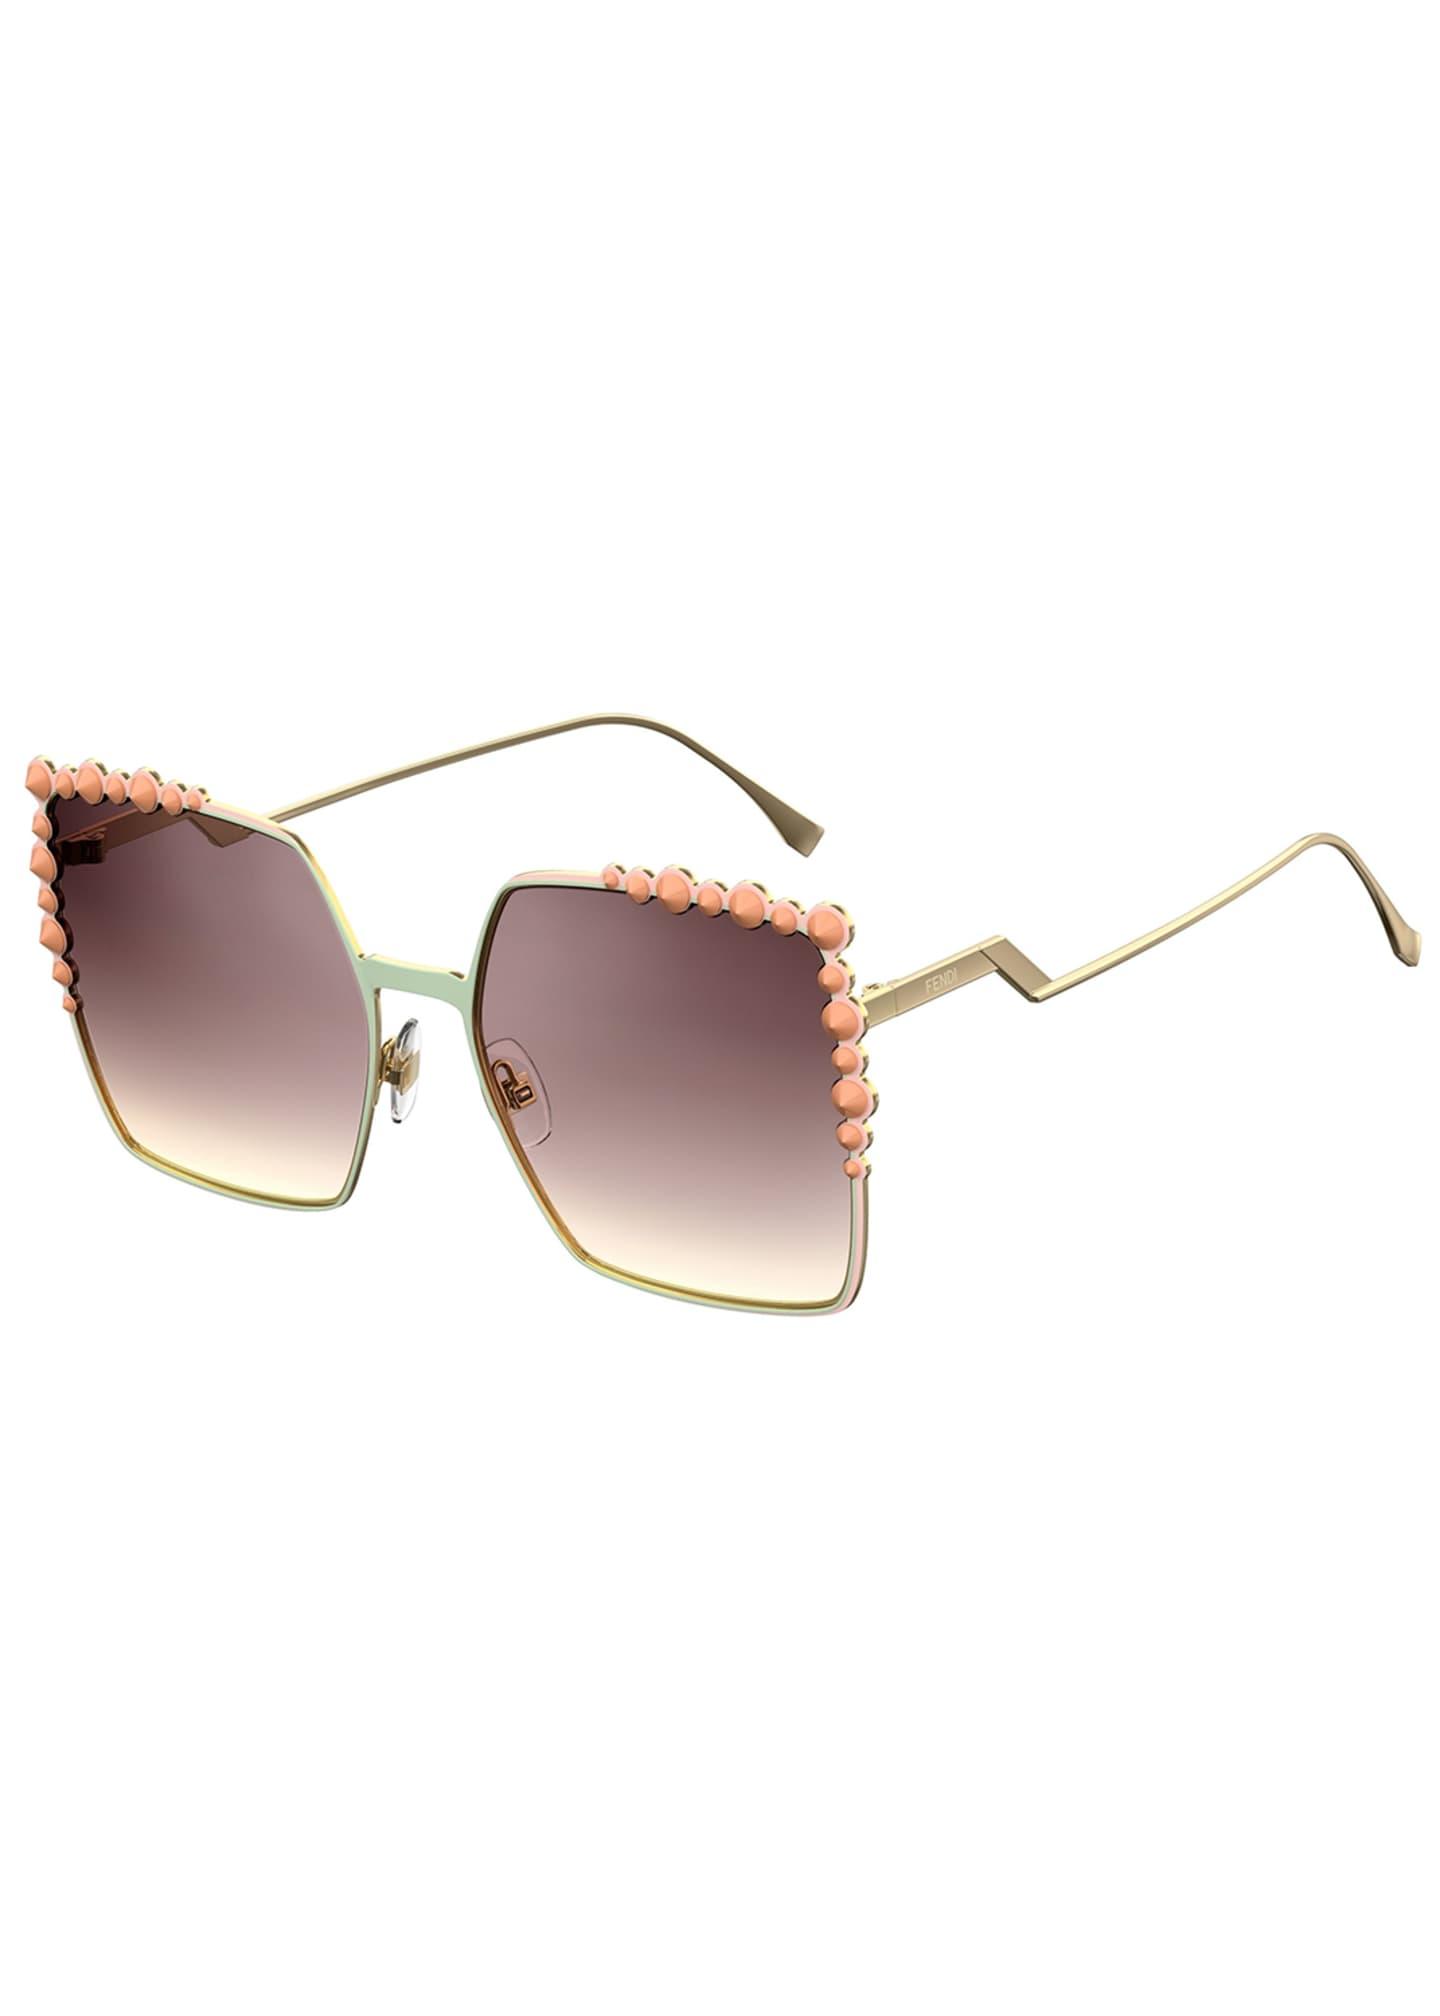 Fendi Can Eye Studded Oversized Square Sunglasses, Pink